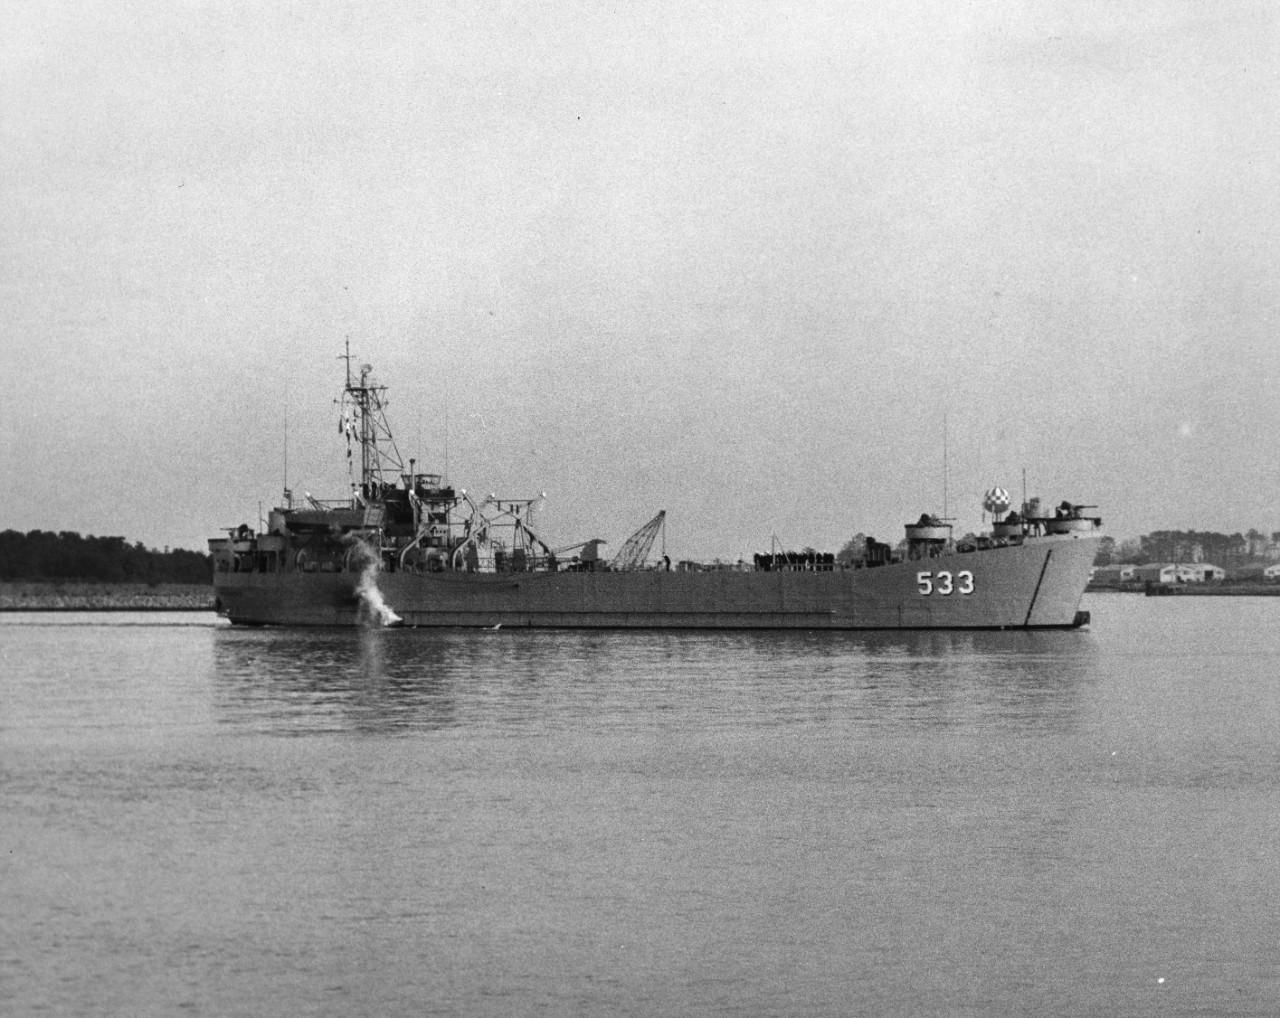 USS Cheboygan County (LST-533)